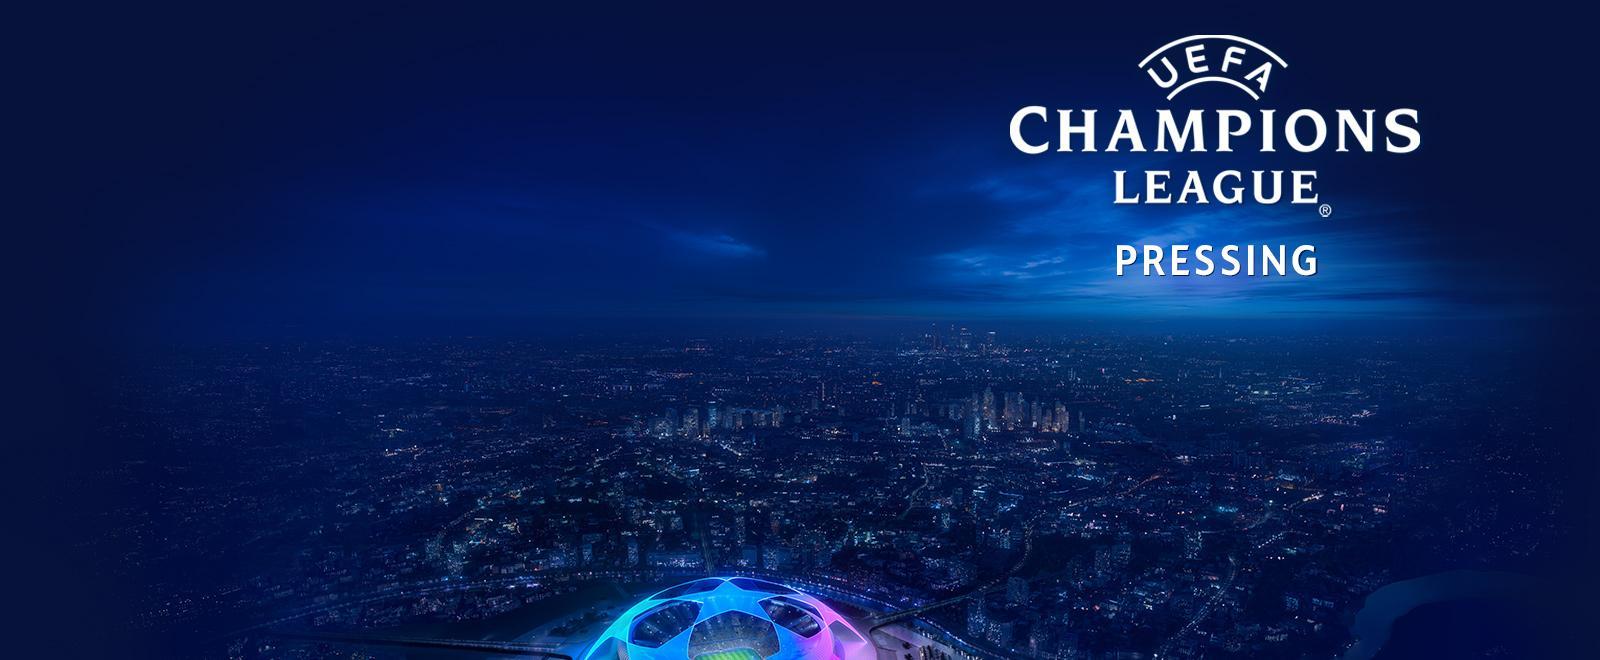 Pressing champions league